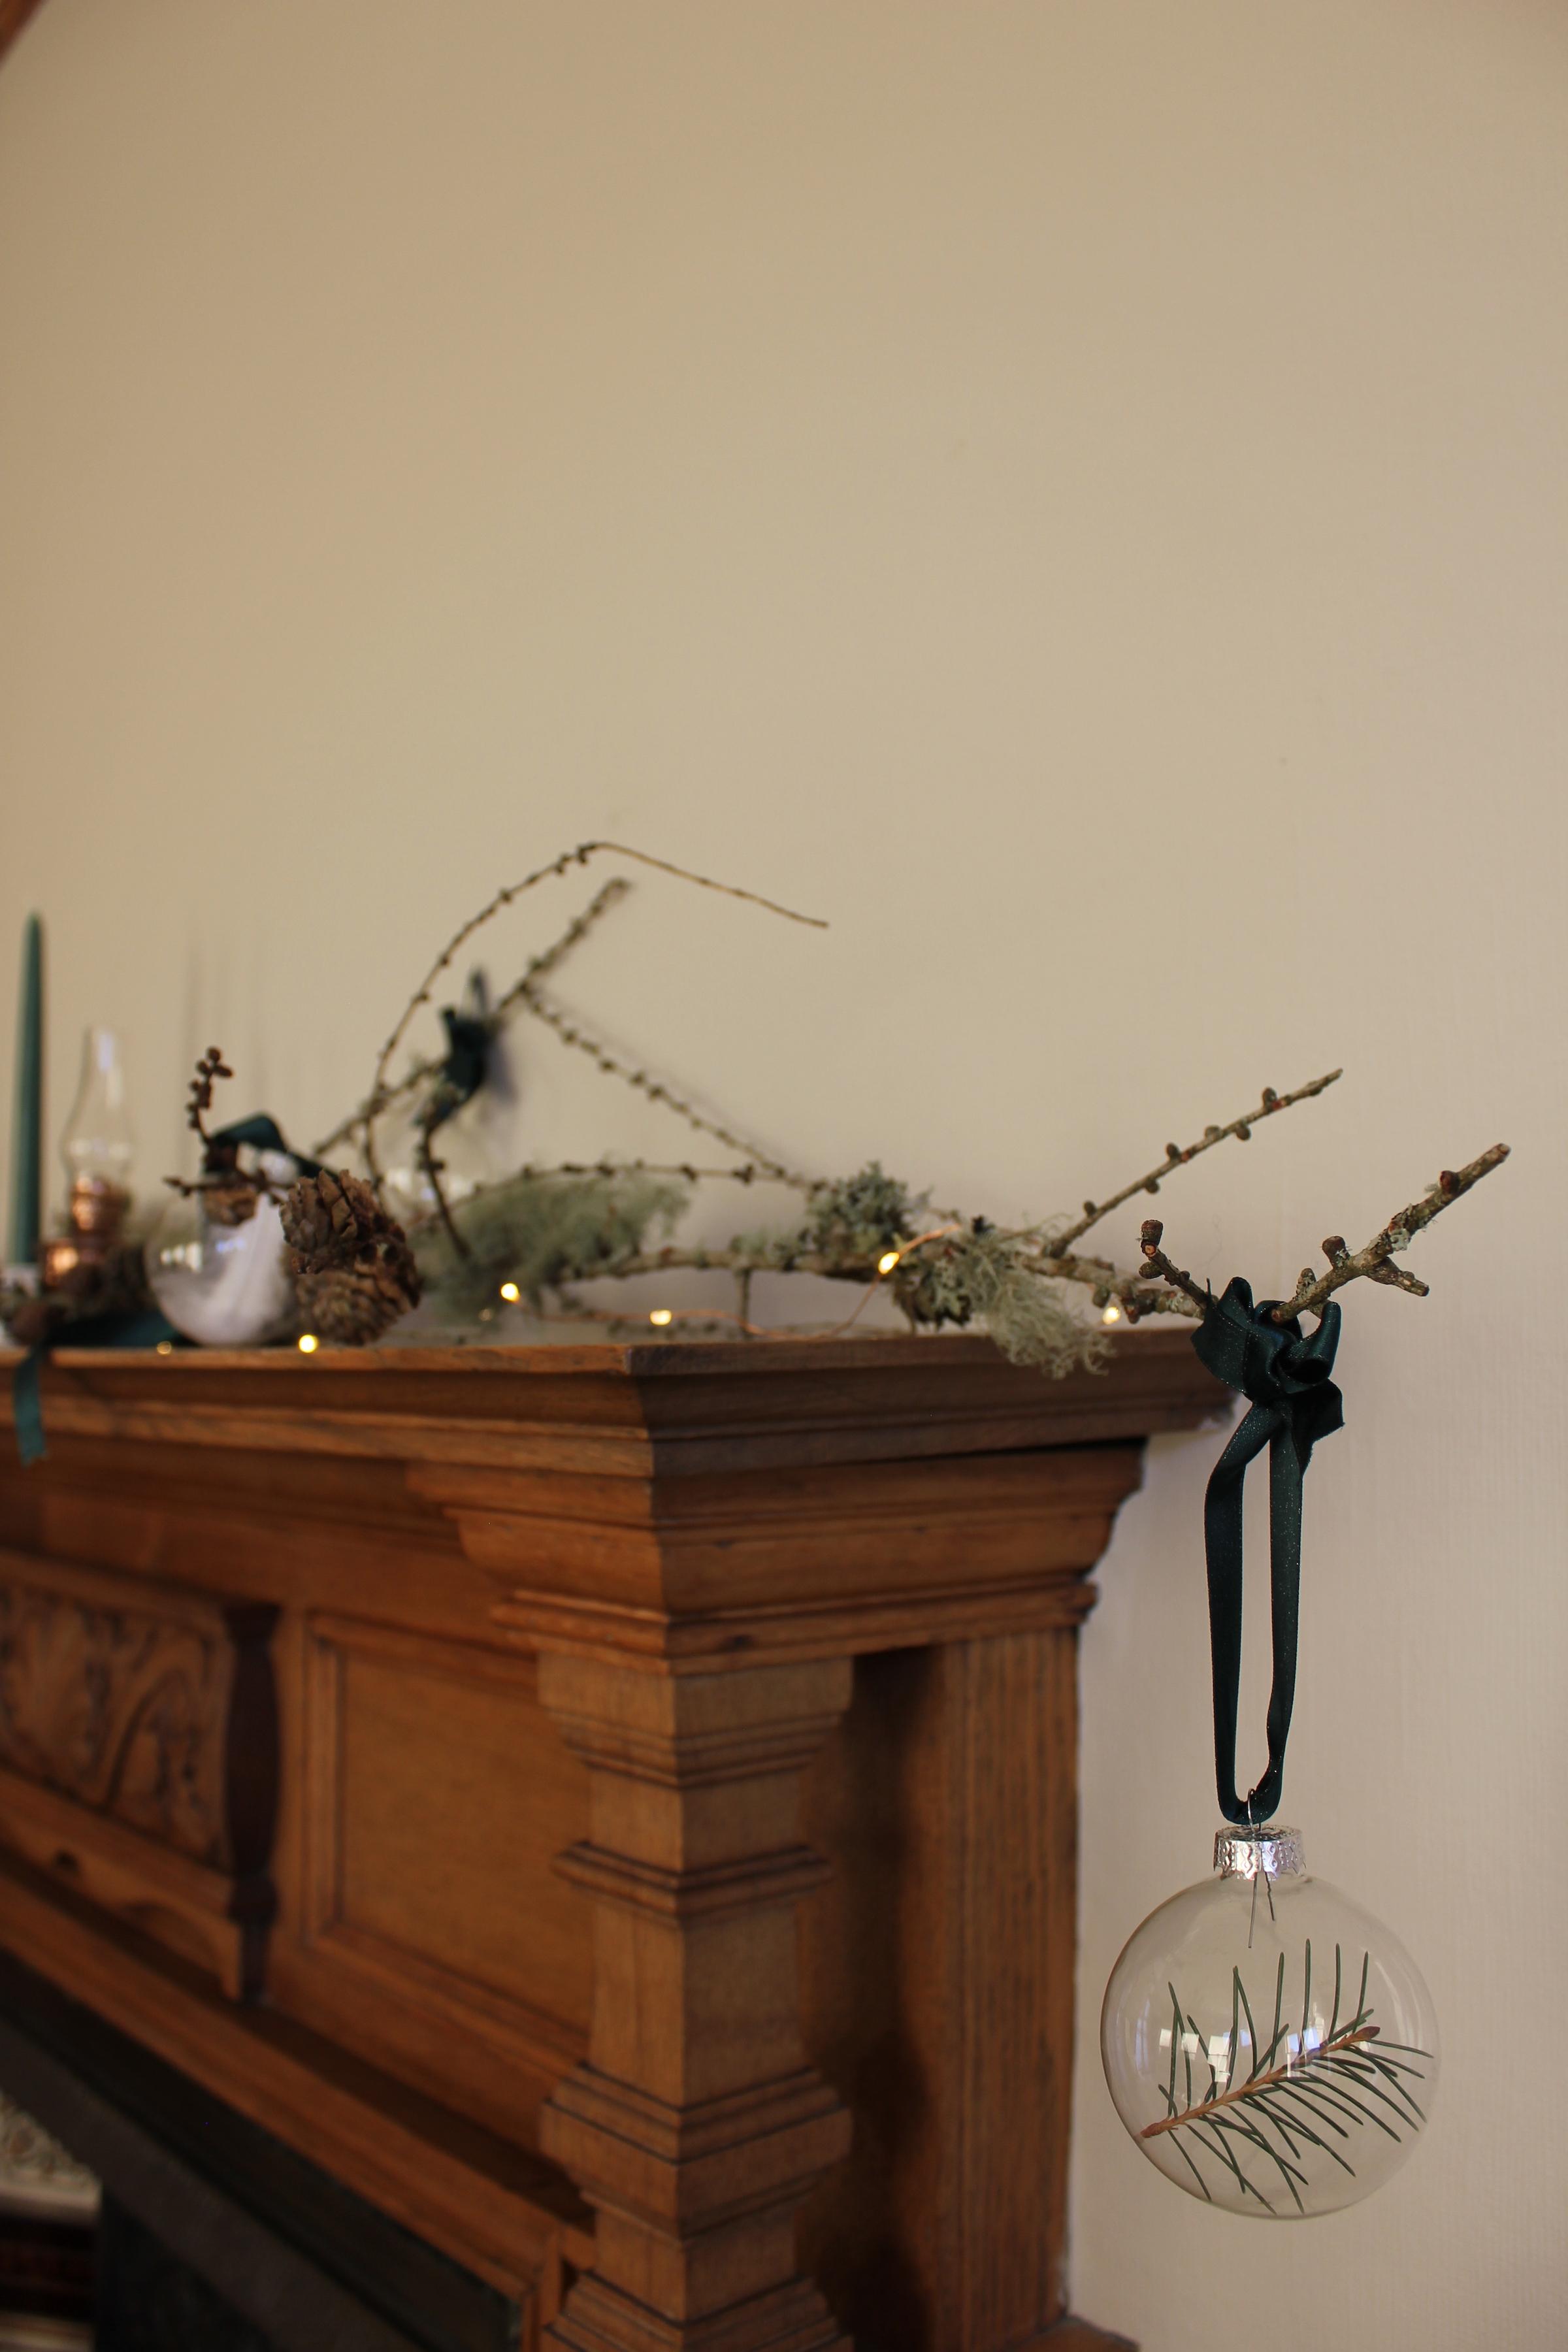 DIY Foraged Christmas Baubles